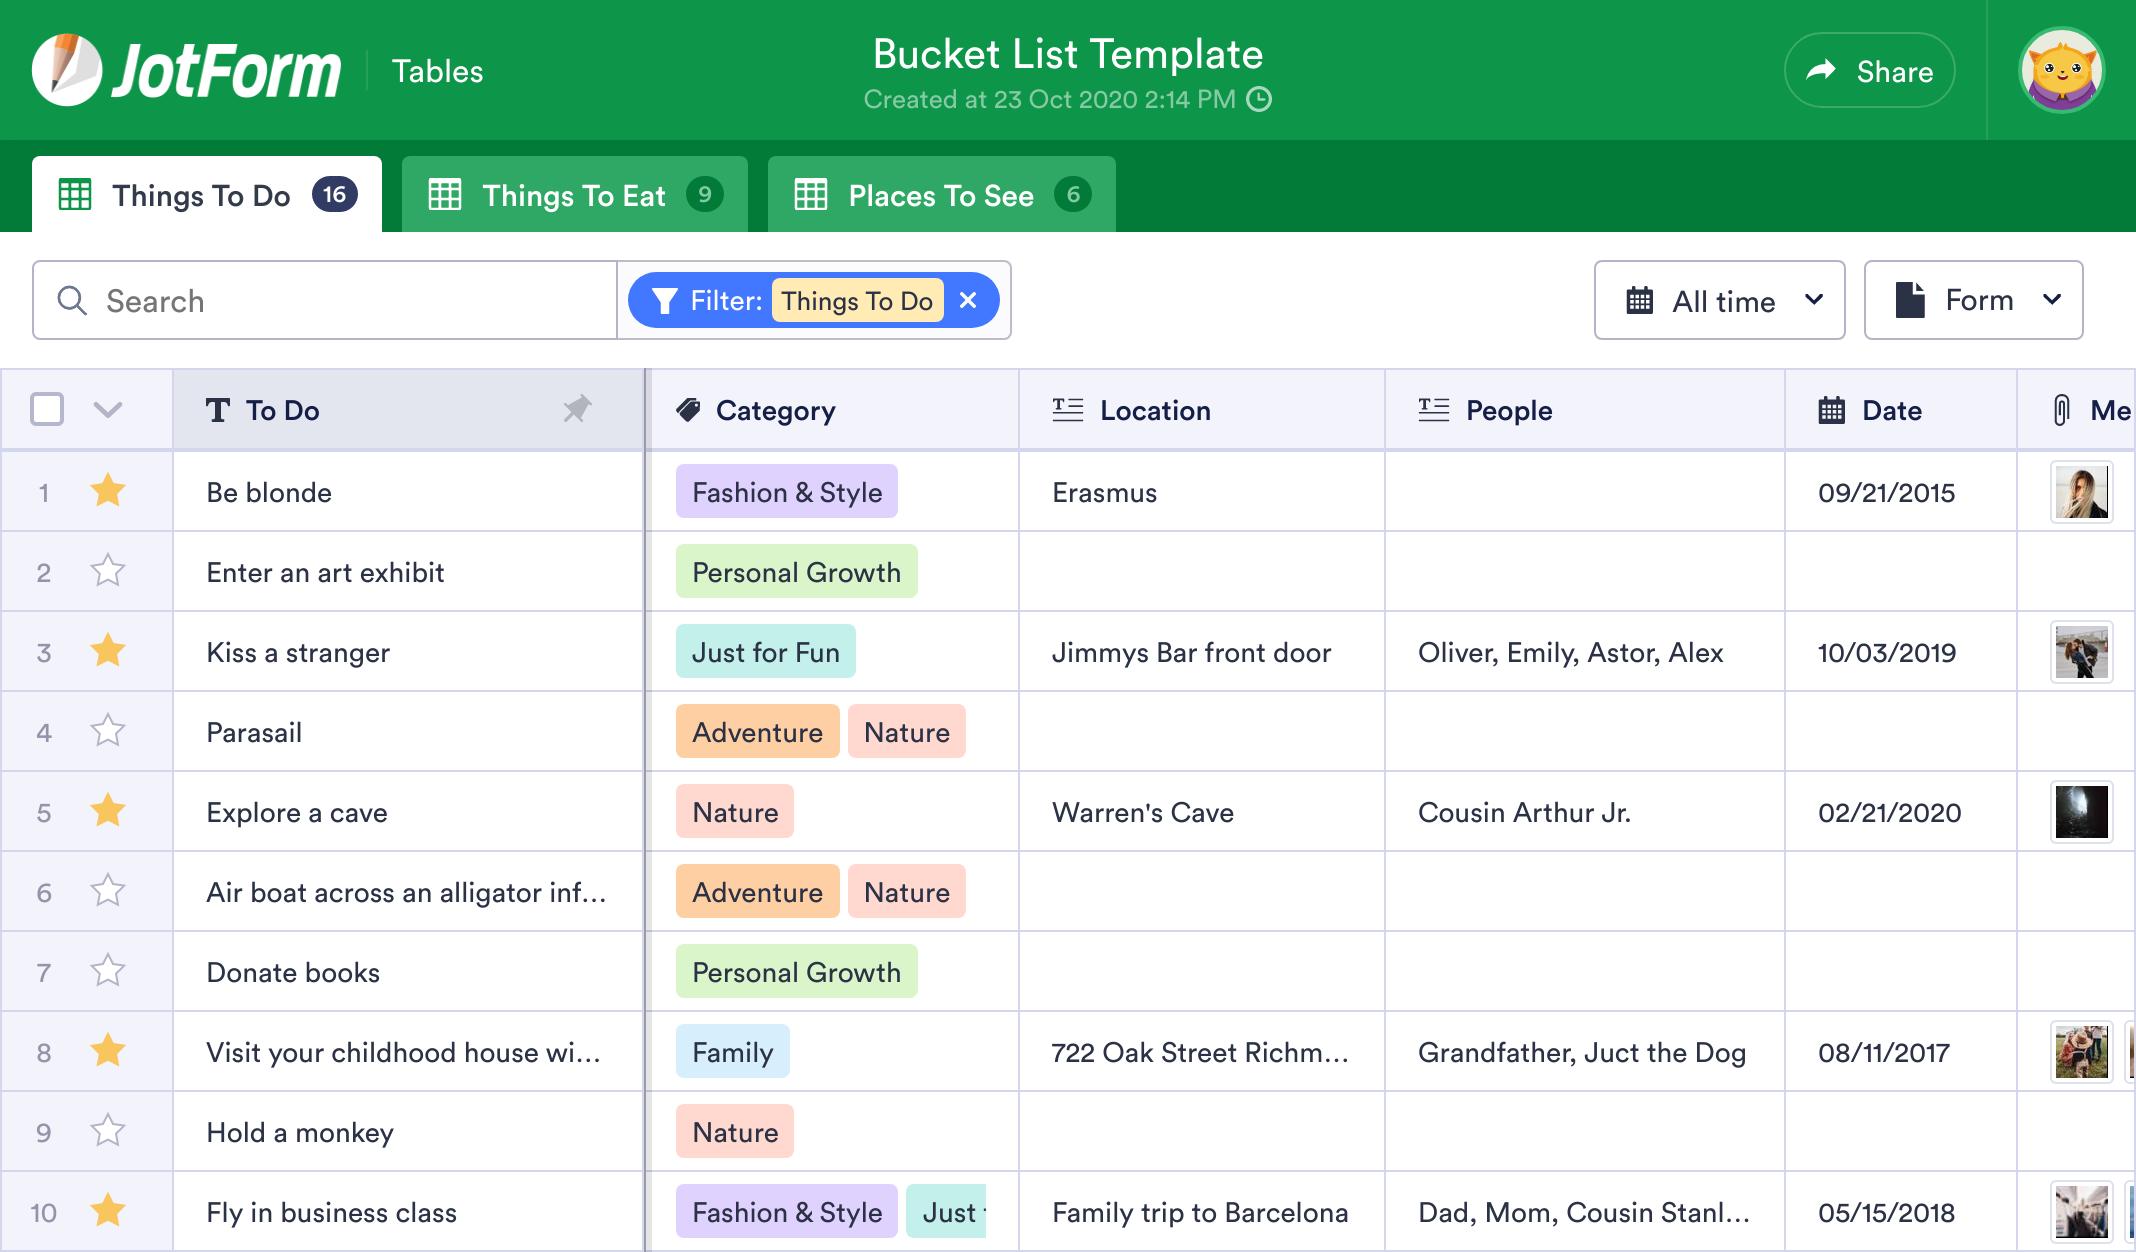 Bucket List Template Jotform Tables